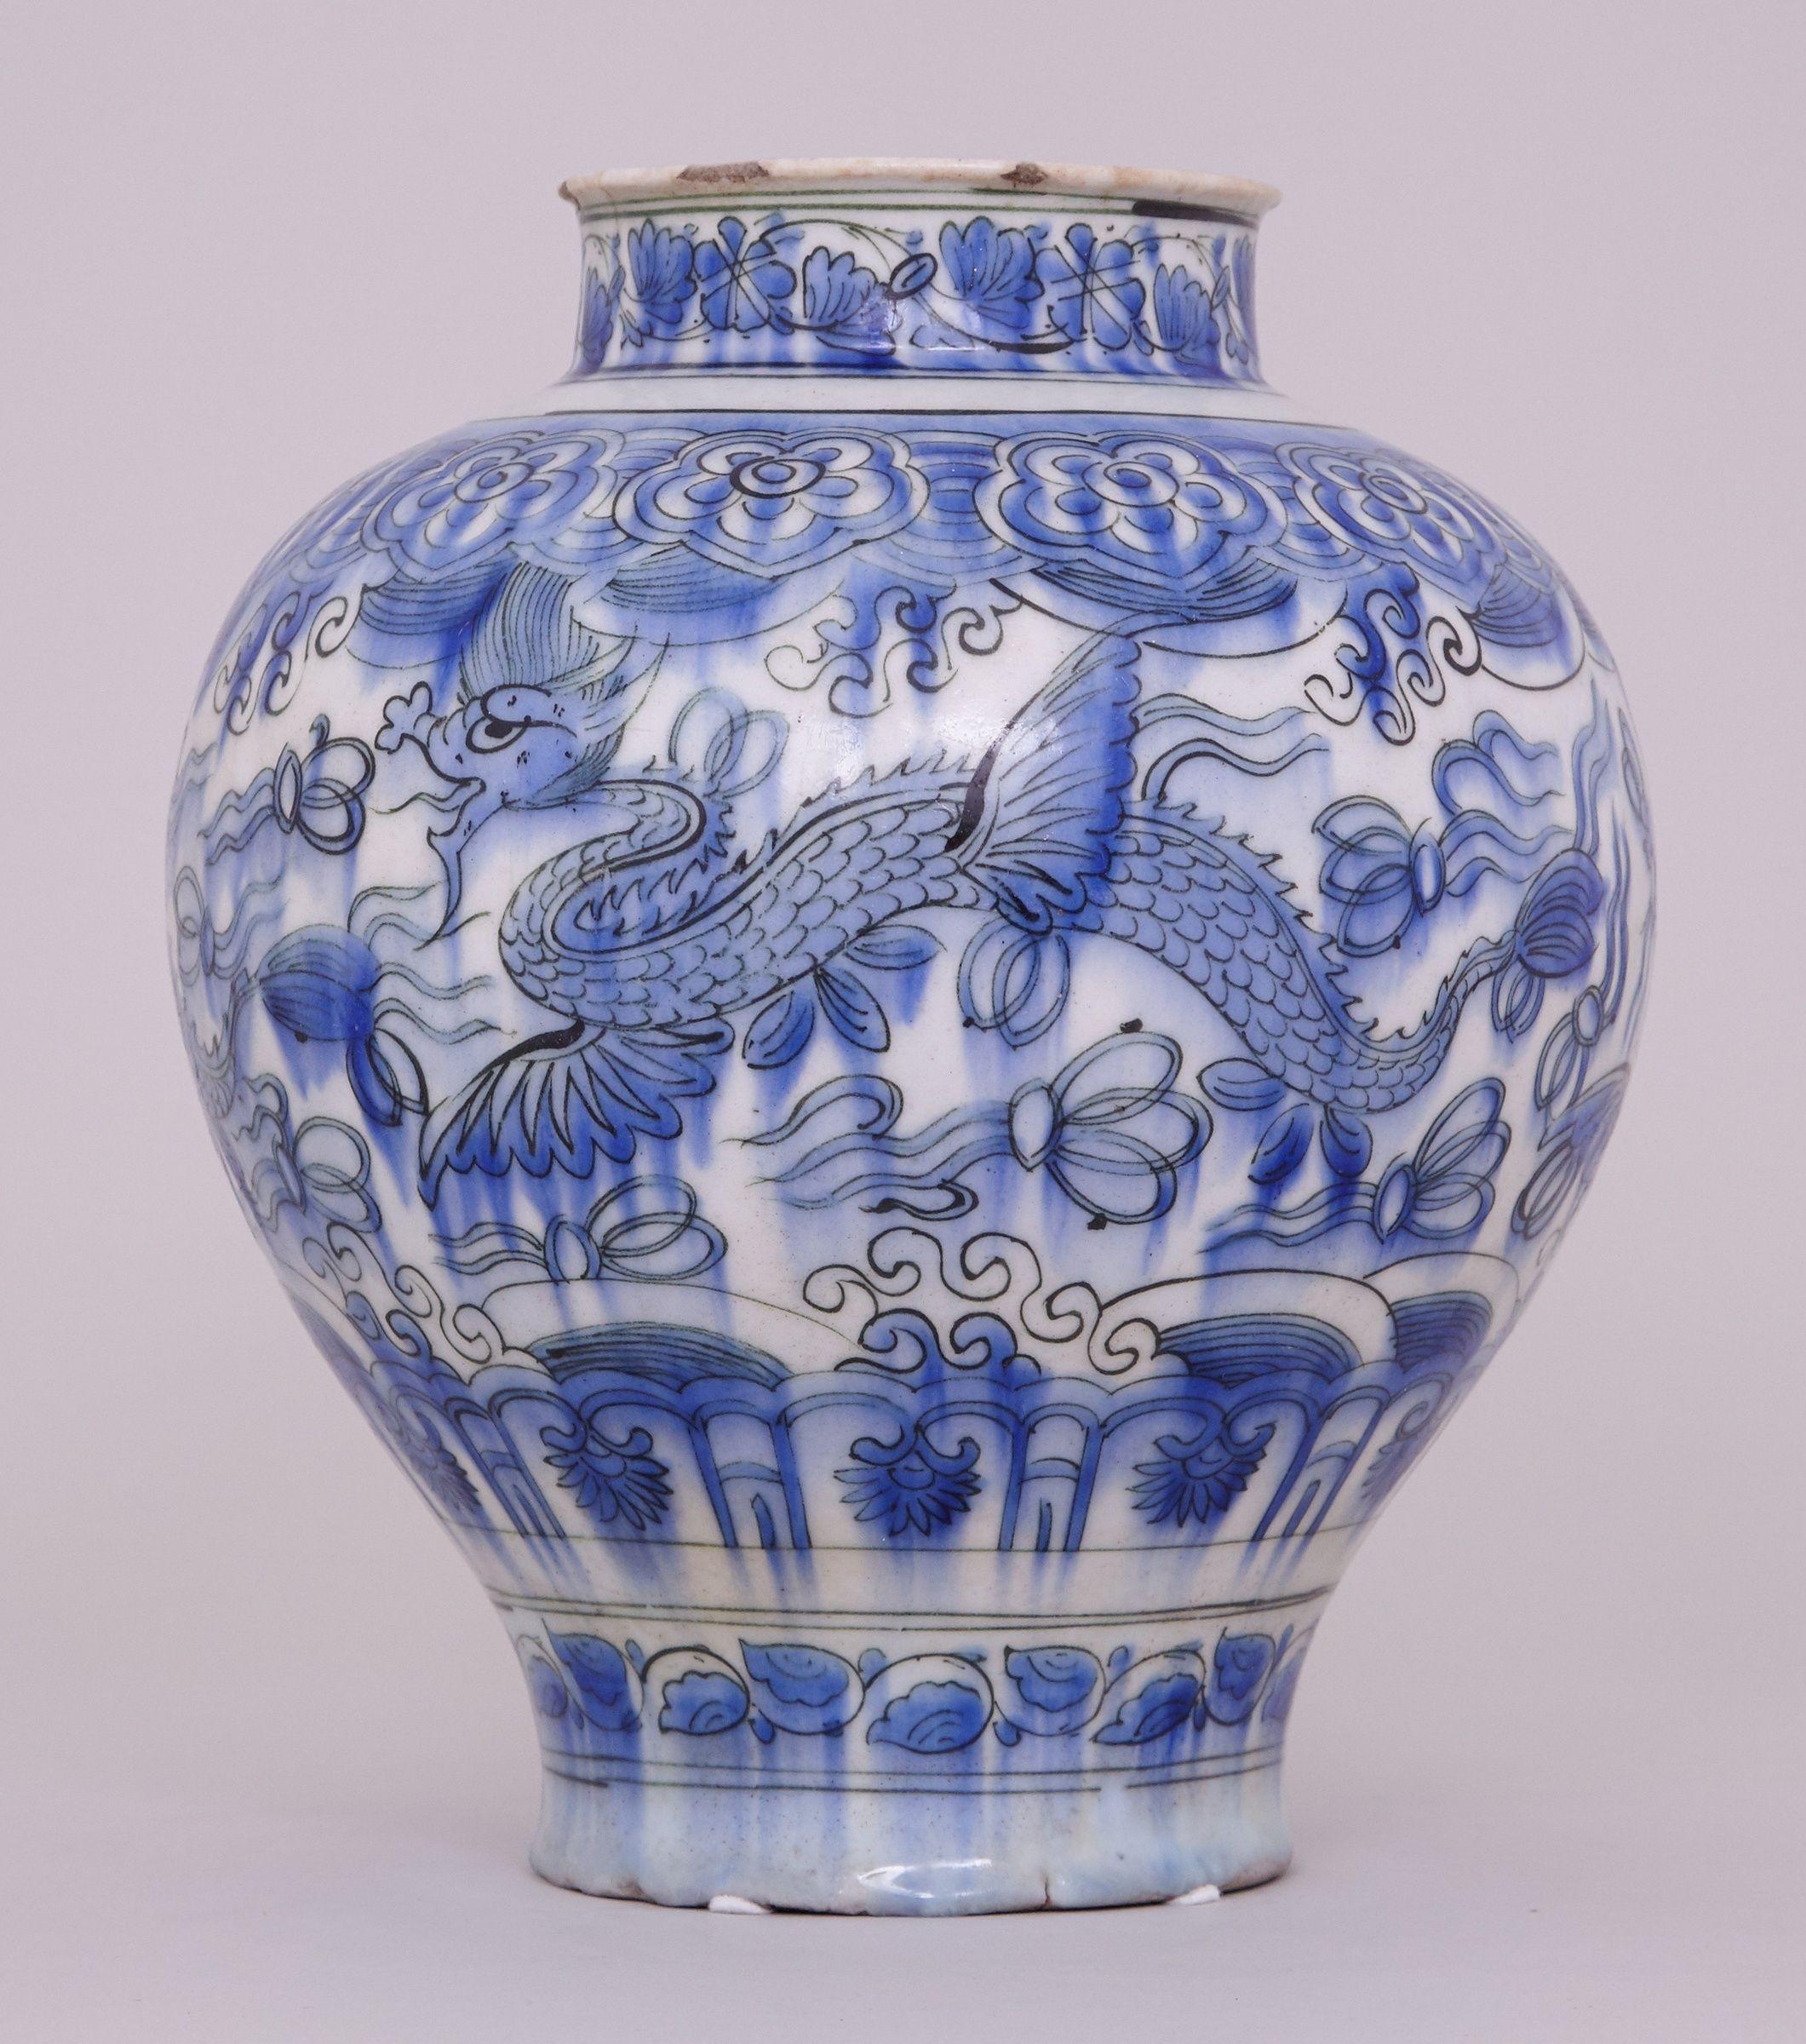 blue terracotta vase of white pottery vase elegant a blue and white persian safavid jar 17th with white pottery vase elegant a blue and white persian safavid jar 17th century